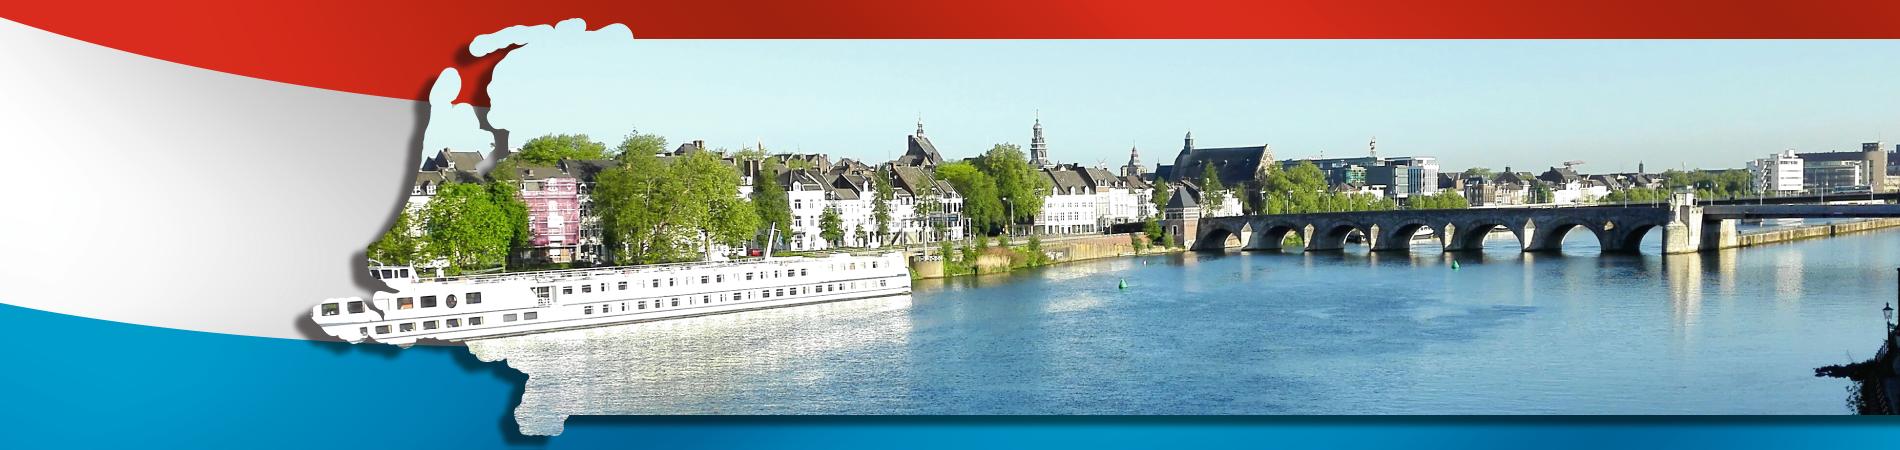 Sint Servaas brug Maastricht